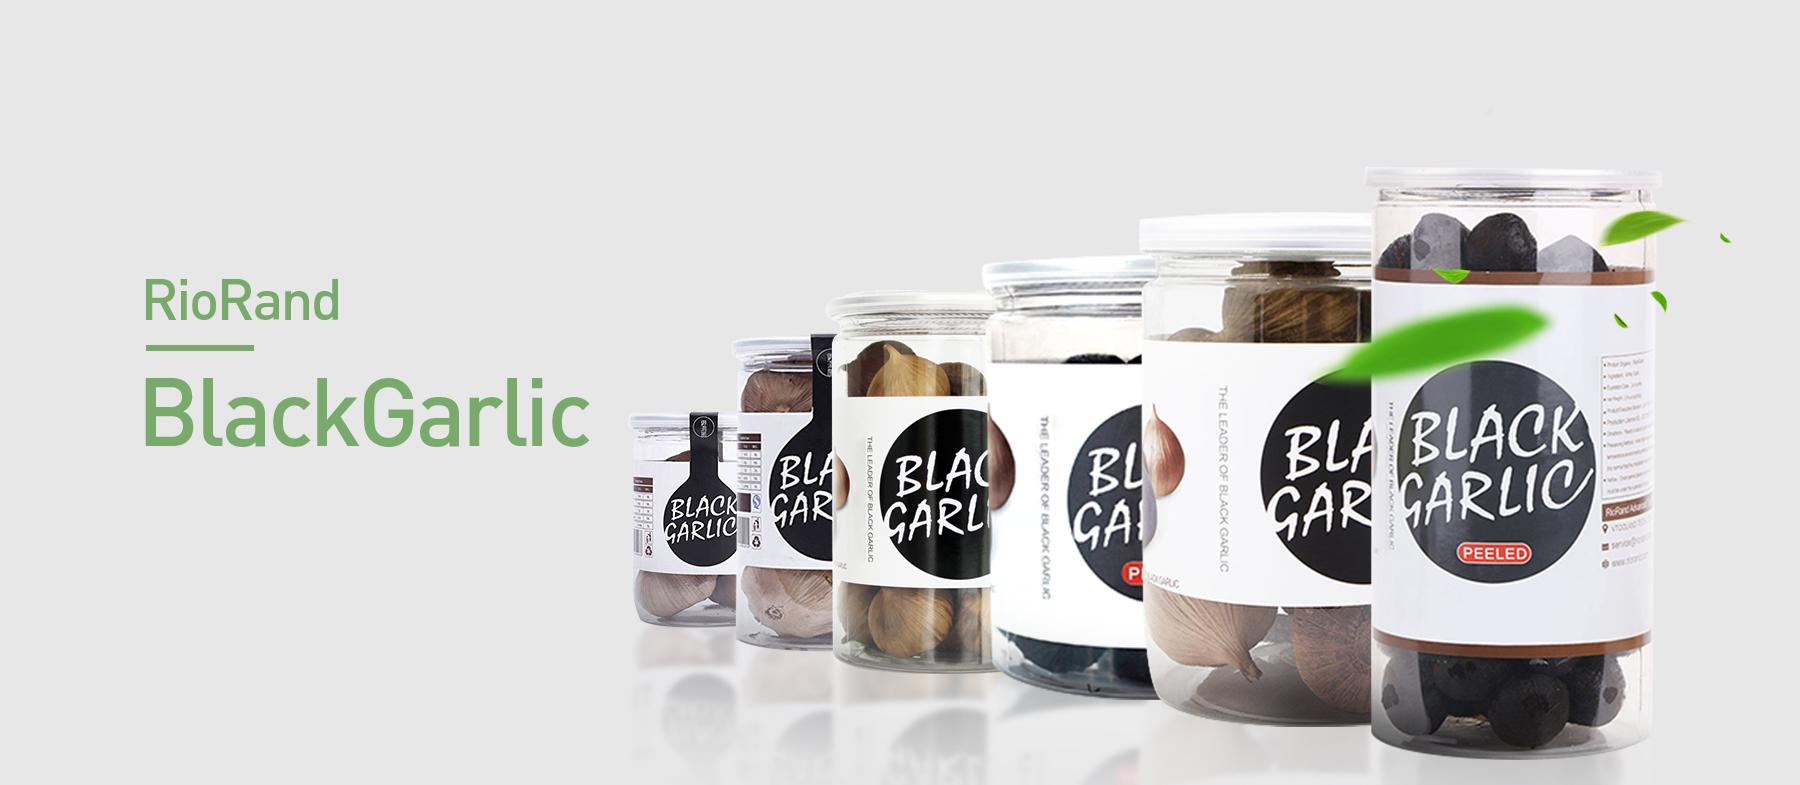 Black-garlic-benefits-4